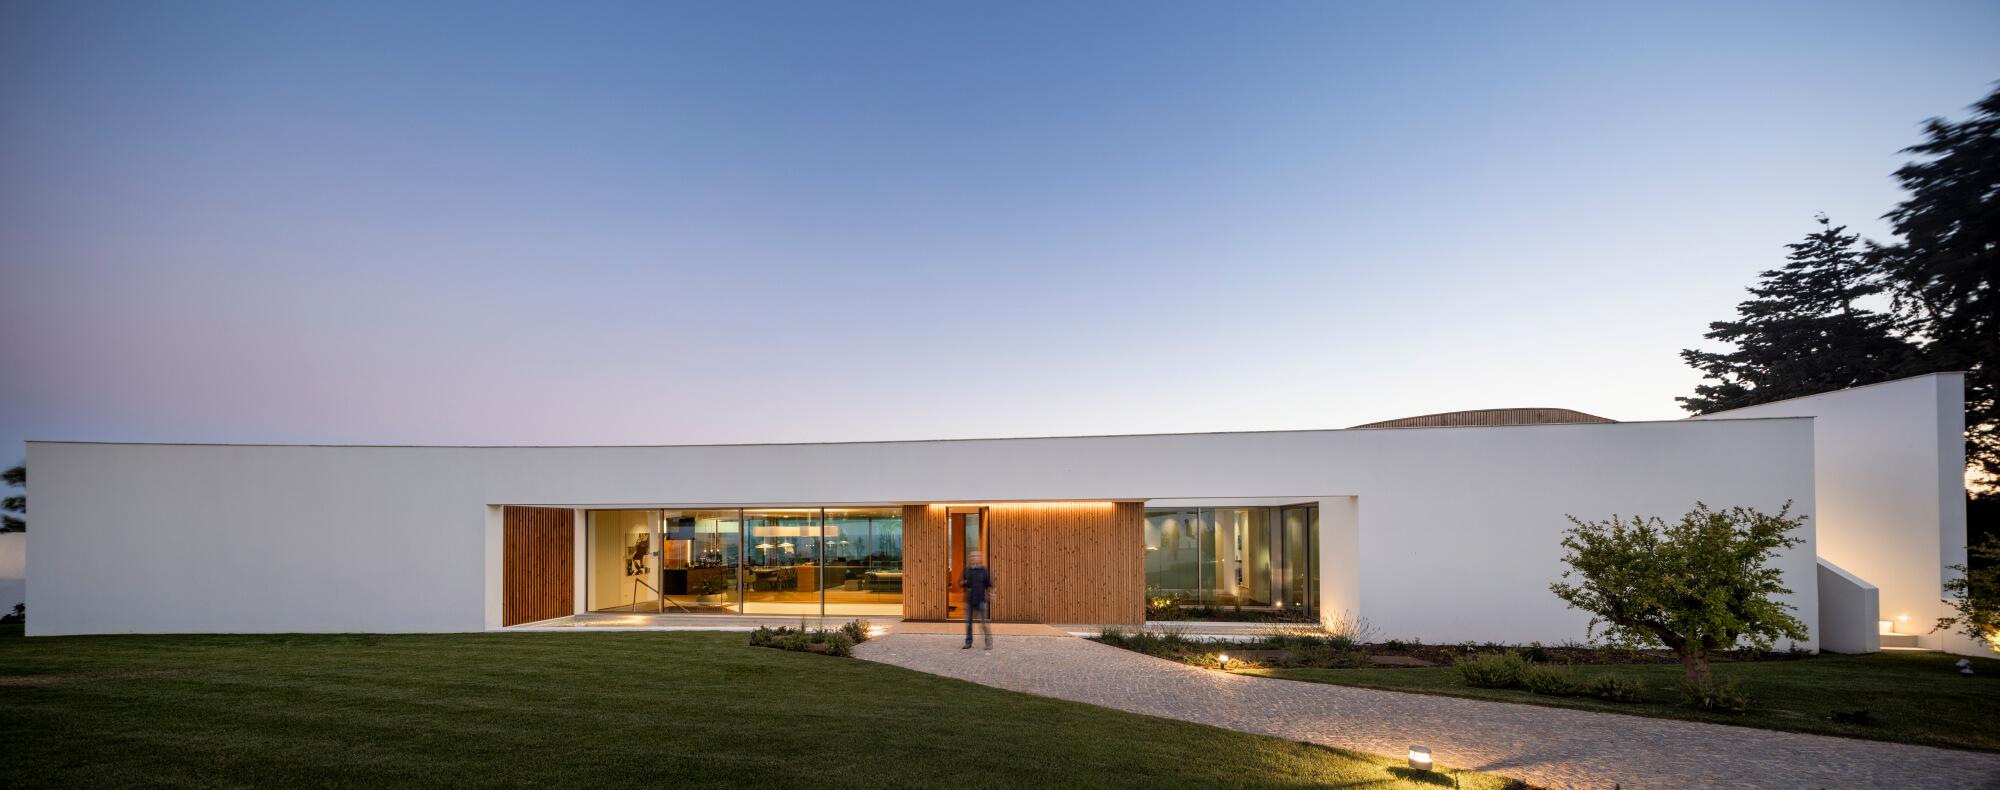 Casas LuxMare